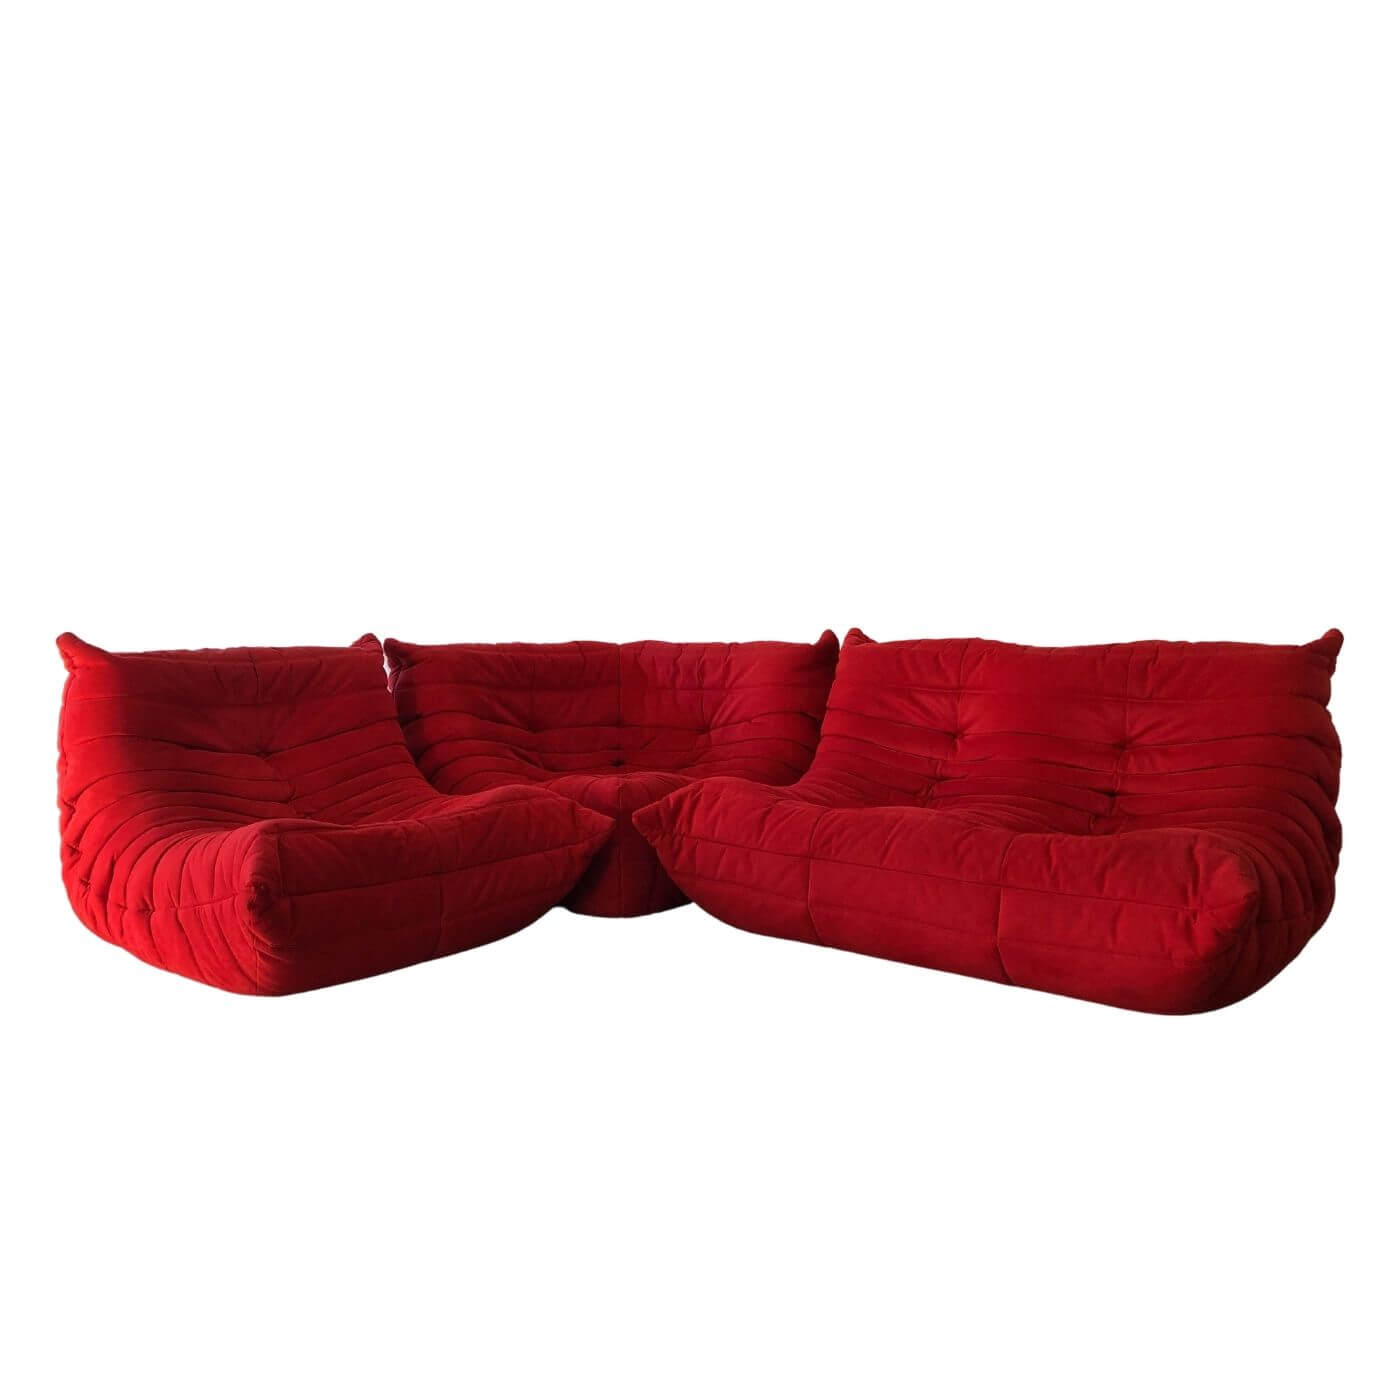 Togo Sofa by Ligne Roset in Angel red alcantara